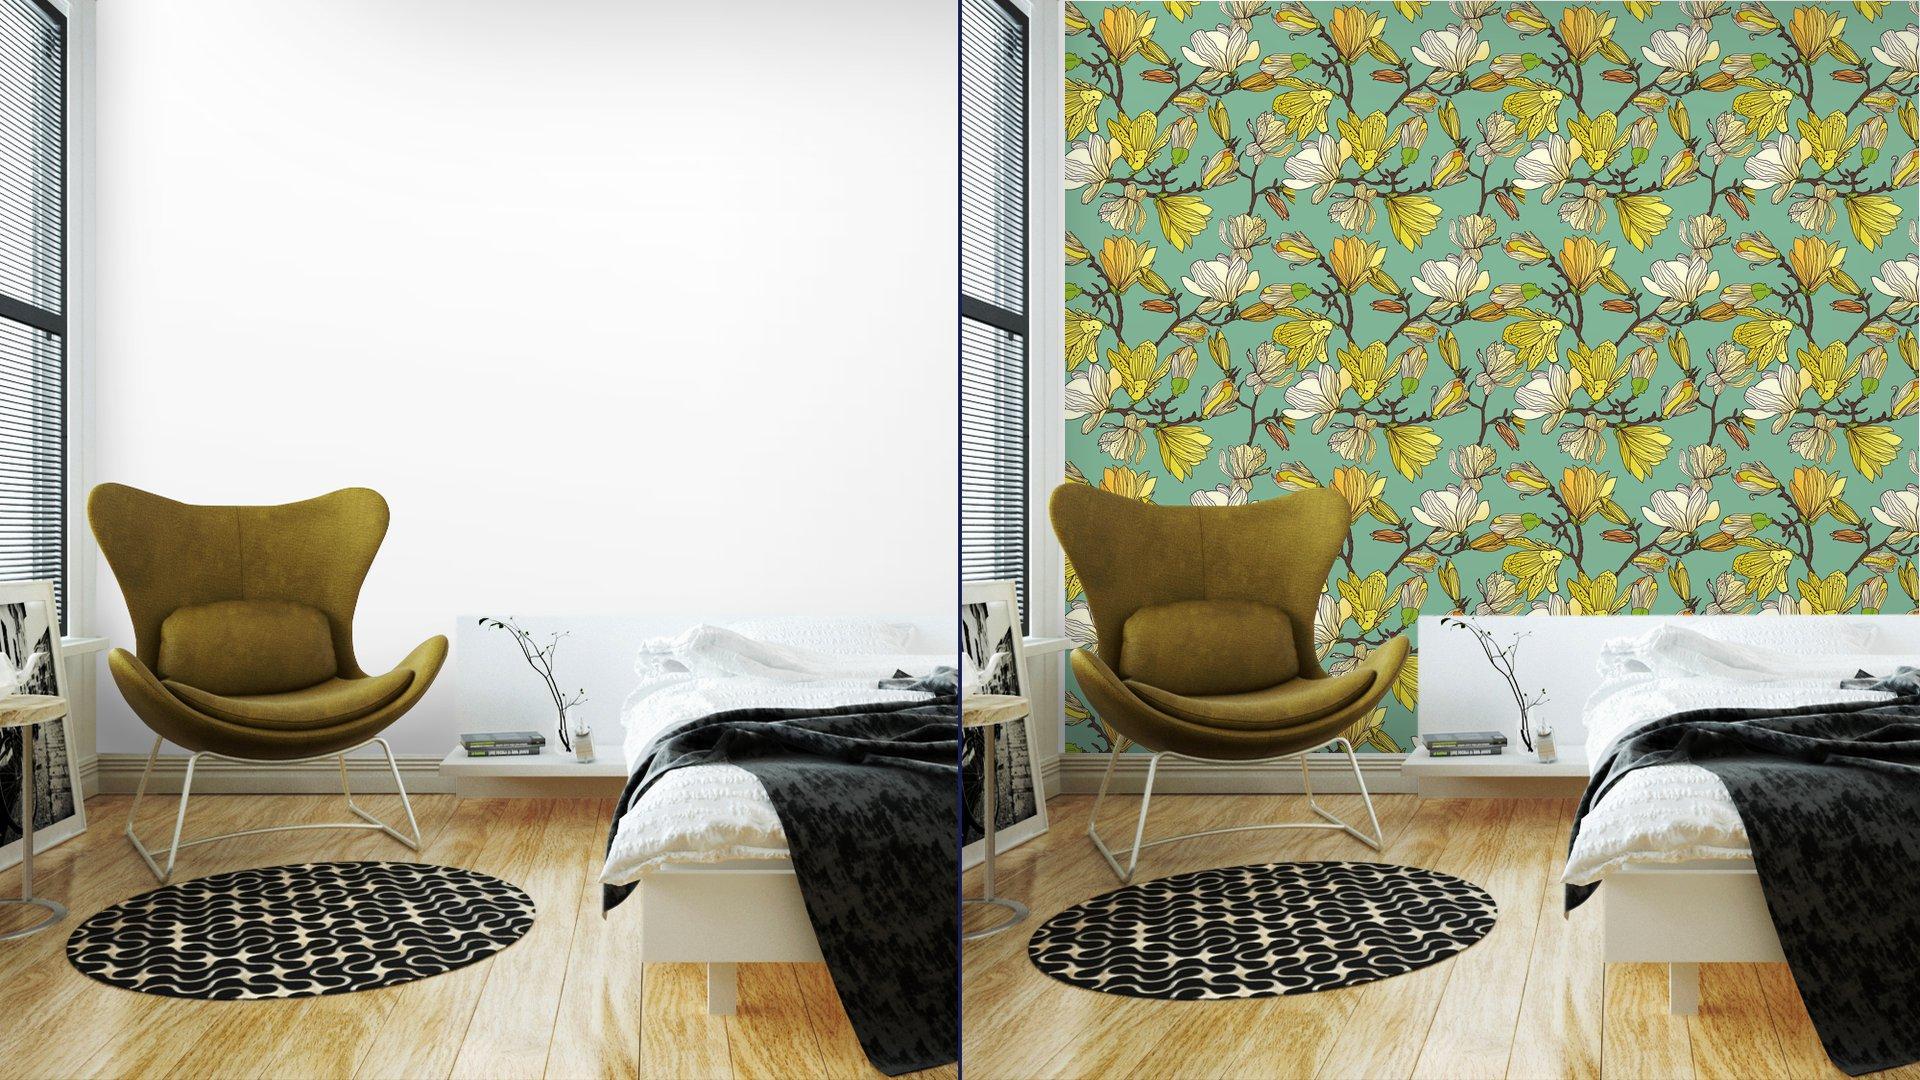 Fotomurales mexico papeles pintados textura floral sin fisuras 5 - Papel Tapiz Patrón Floral en Fondo Azul Tipo Vintage 01